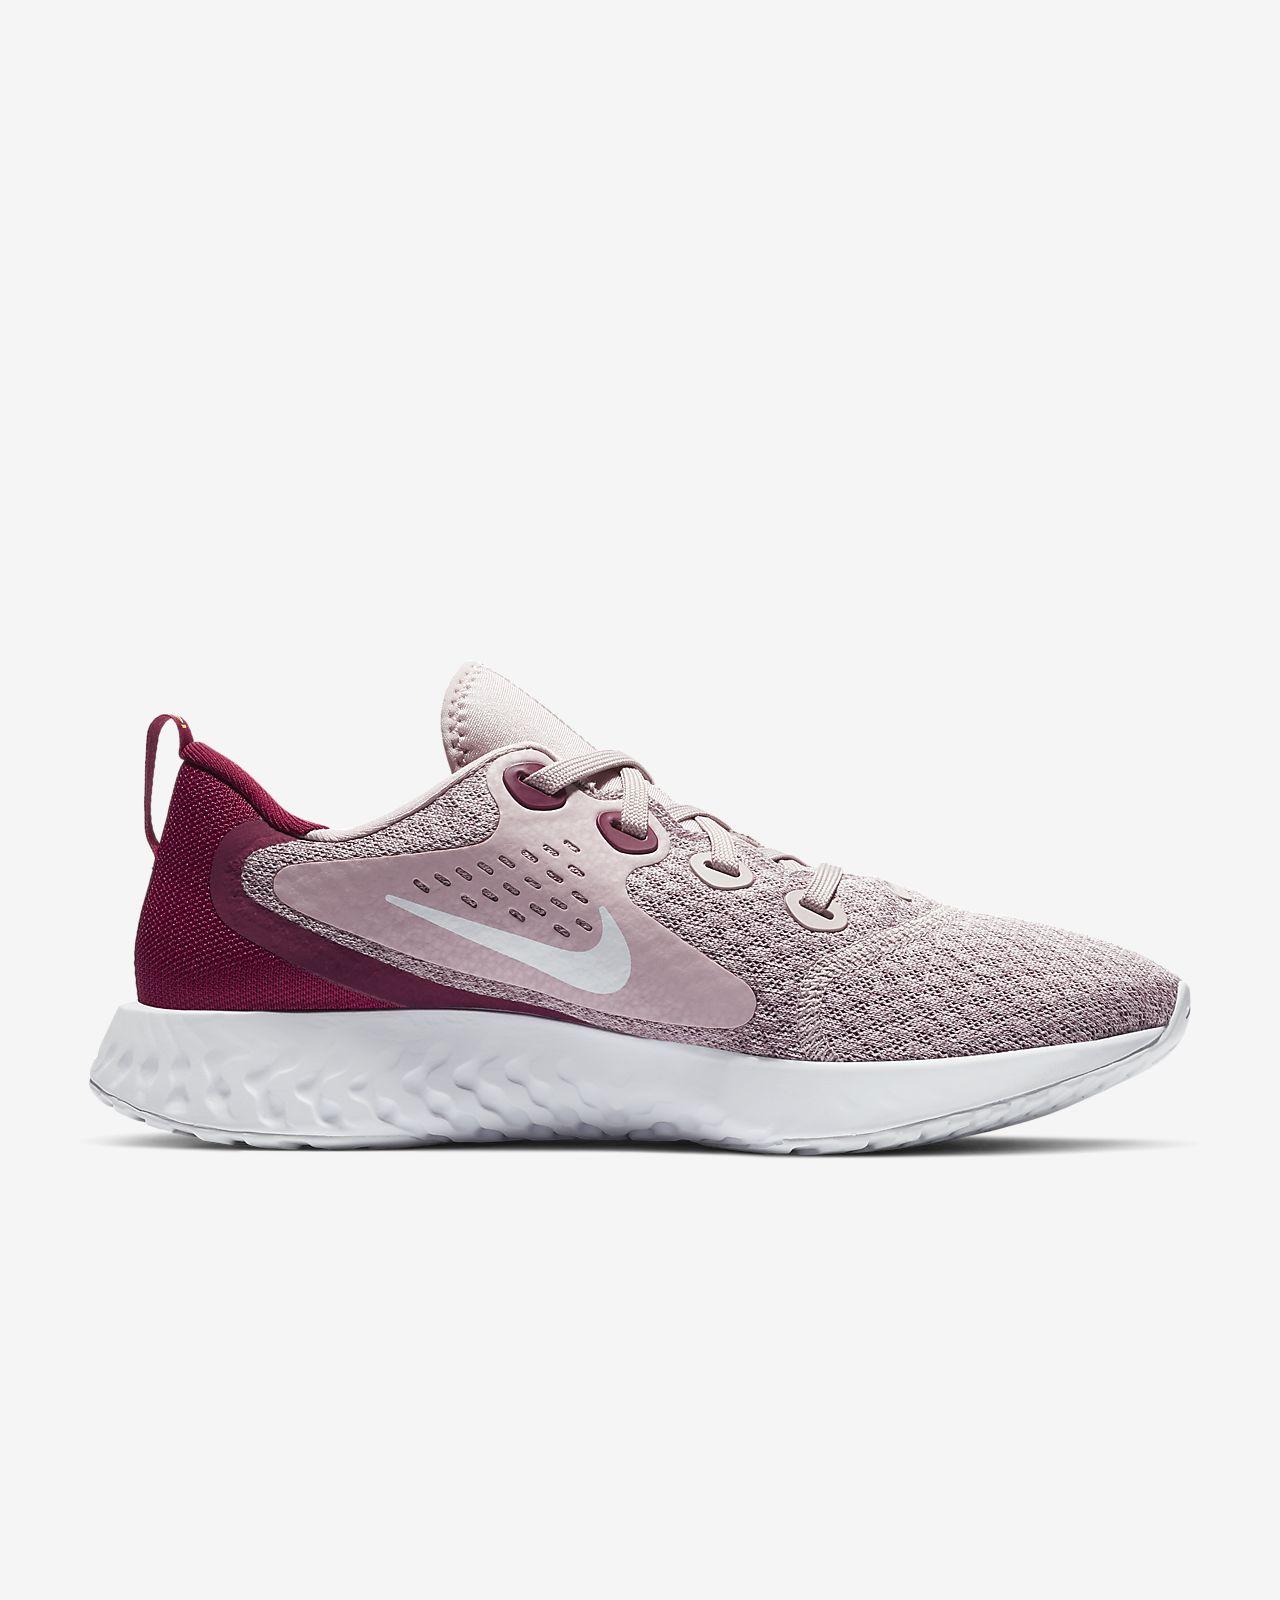 3e8ef273c4fed Nike Legend React Zapatillas de running - Mujer. Nike.com ES